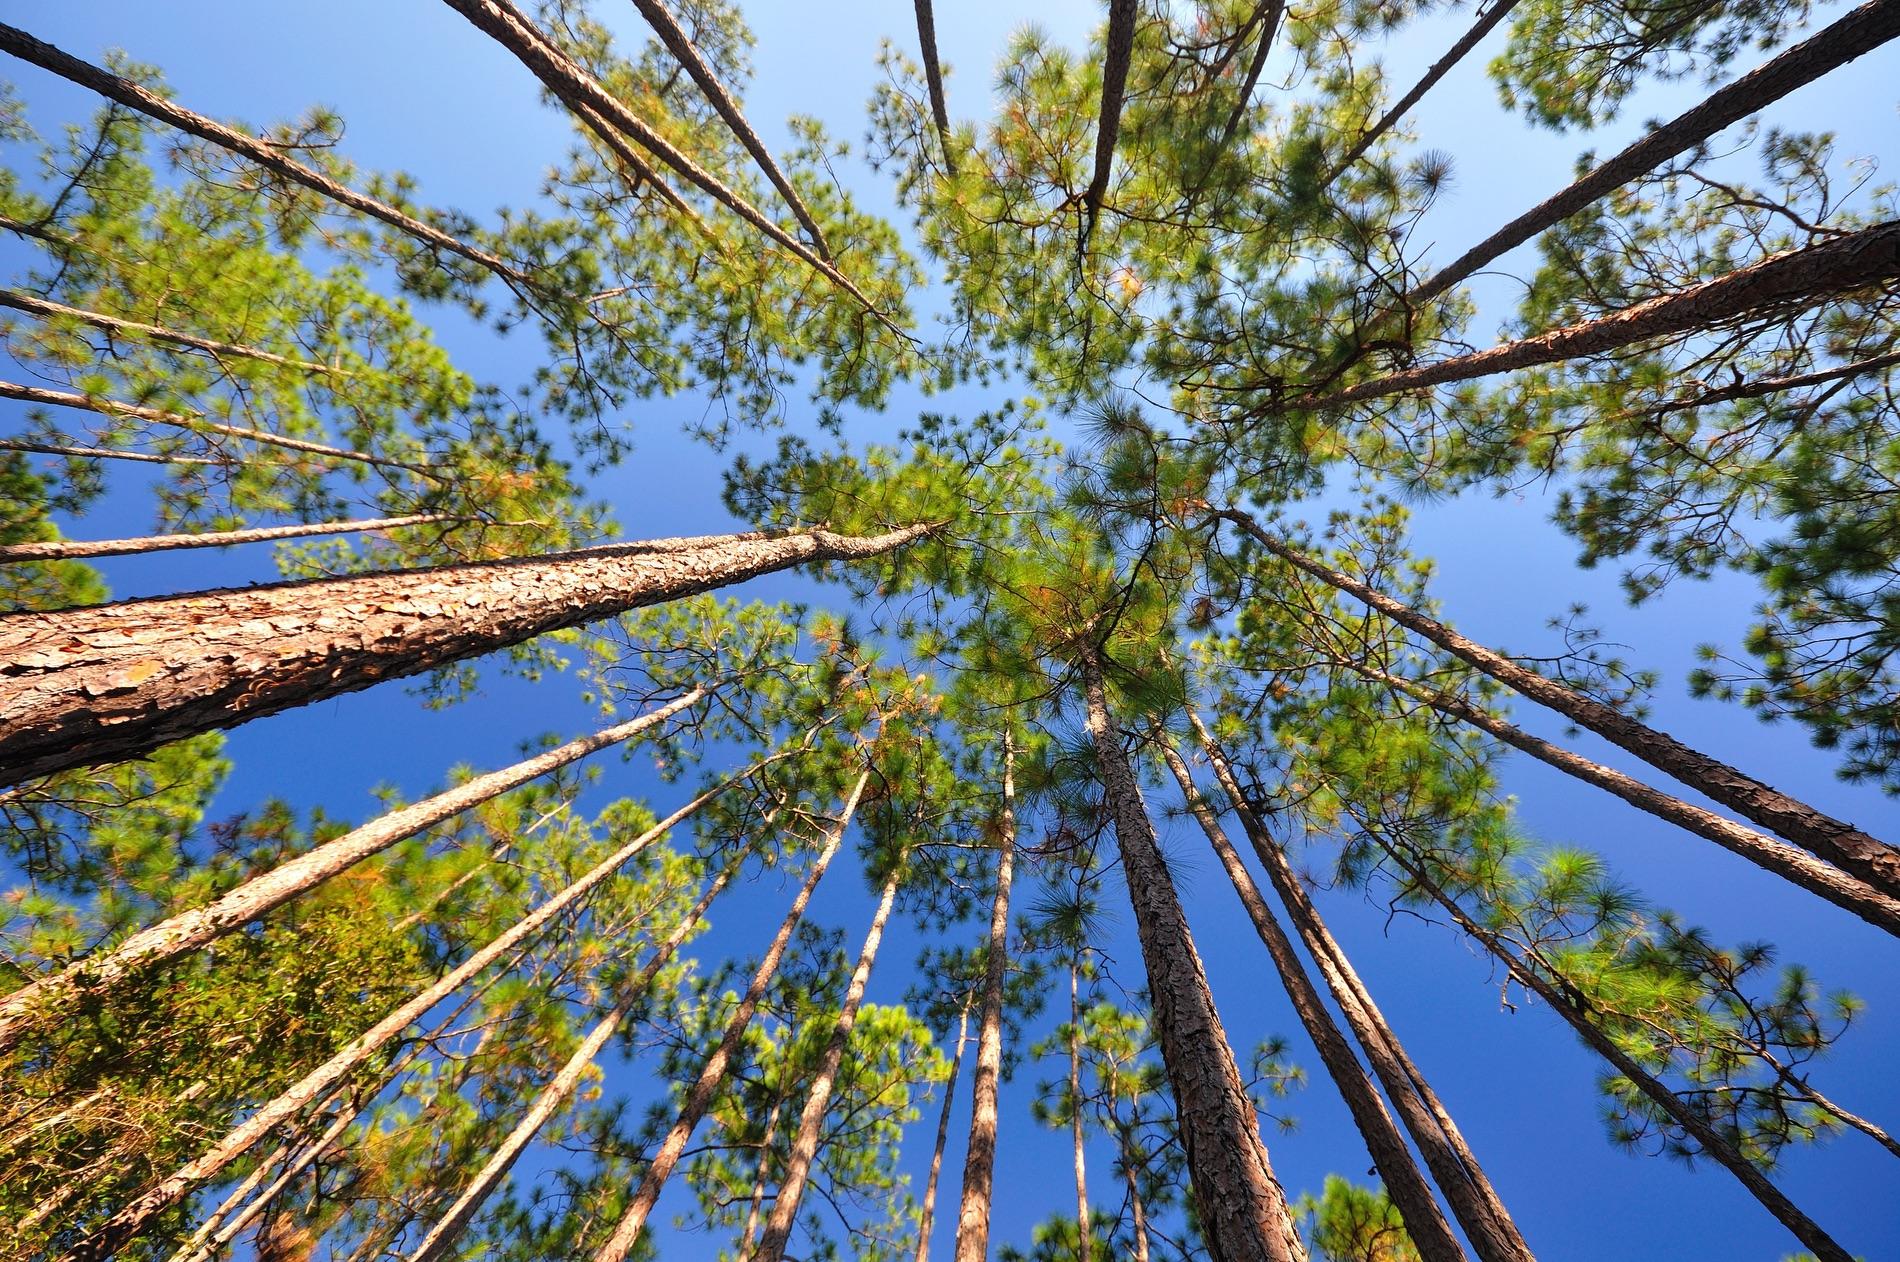 florida longleaf pine canopy from below